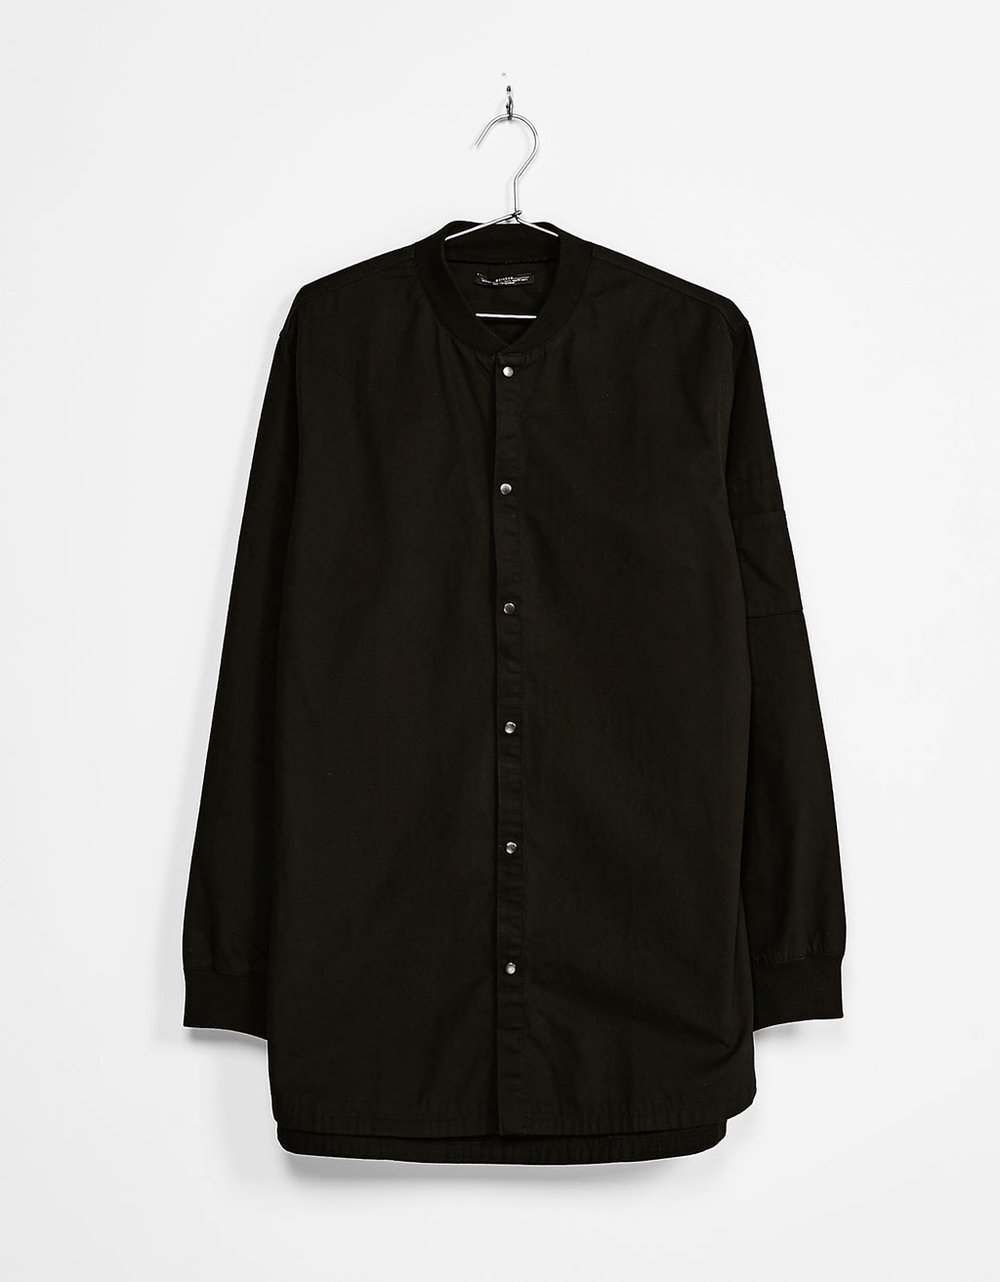 Bomber-style overshirt with cuff details, £22.99 ( bershka.com )